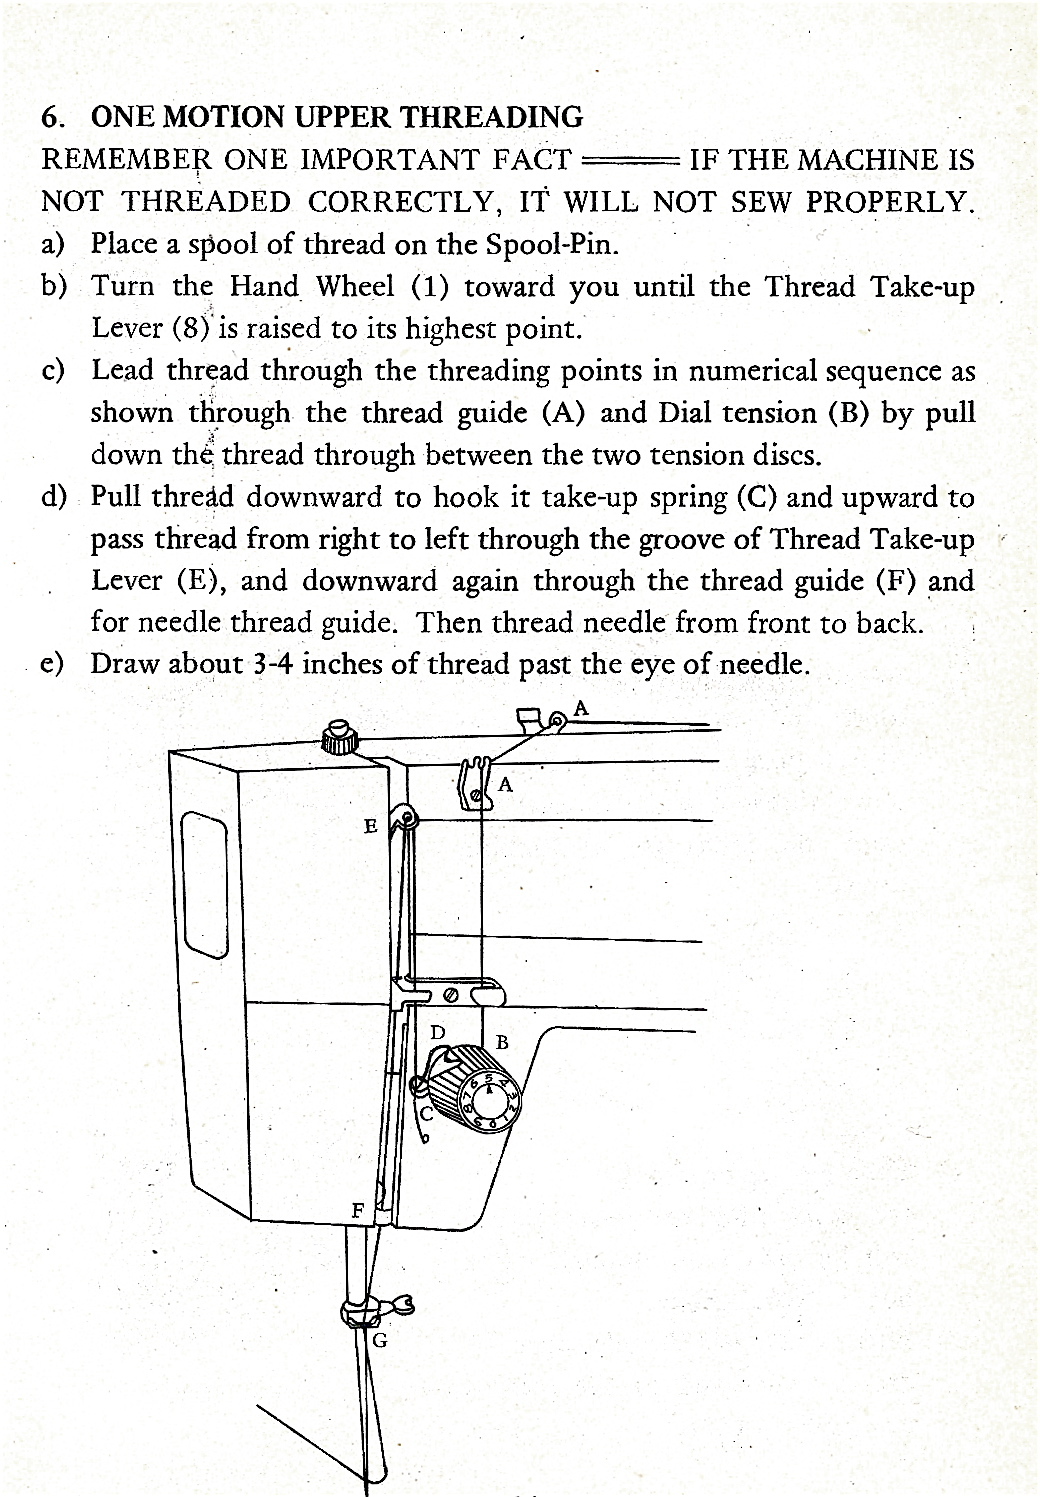 ELGIN 4400F Sewing Machine